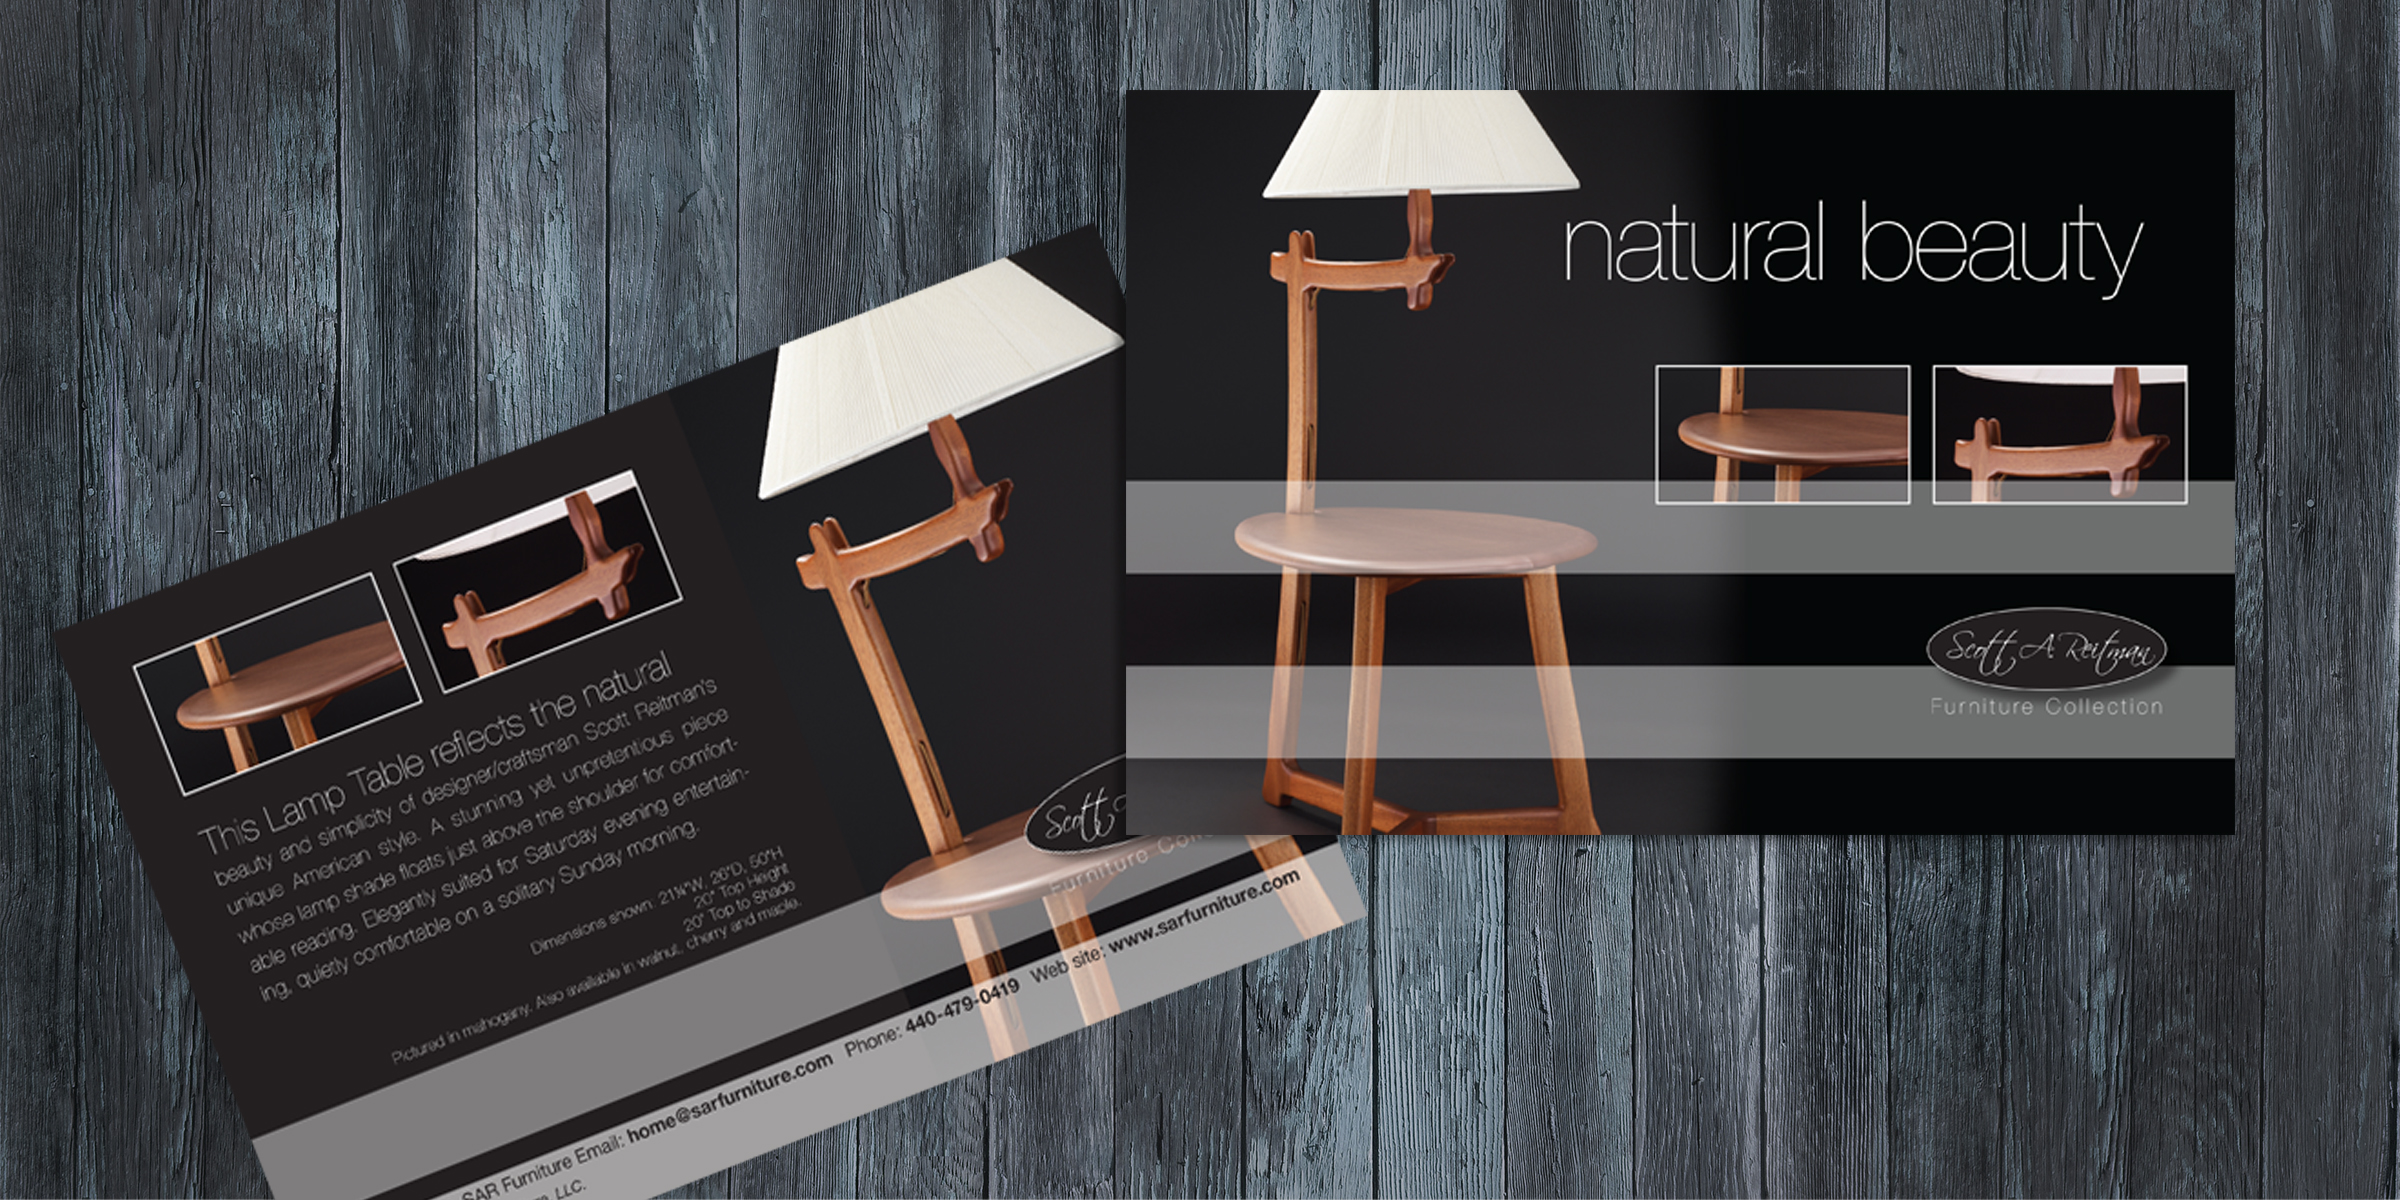 SAR Furniture - Direct Mail Postcard 1